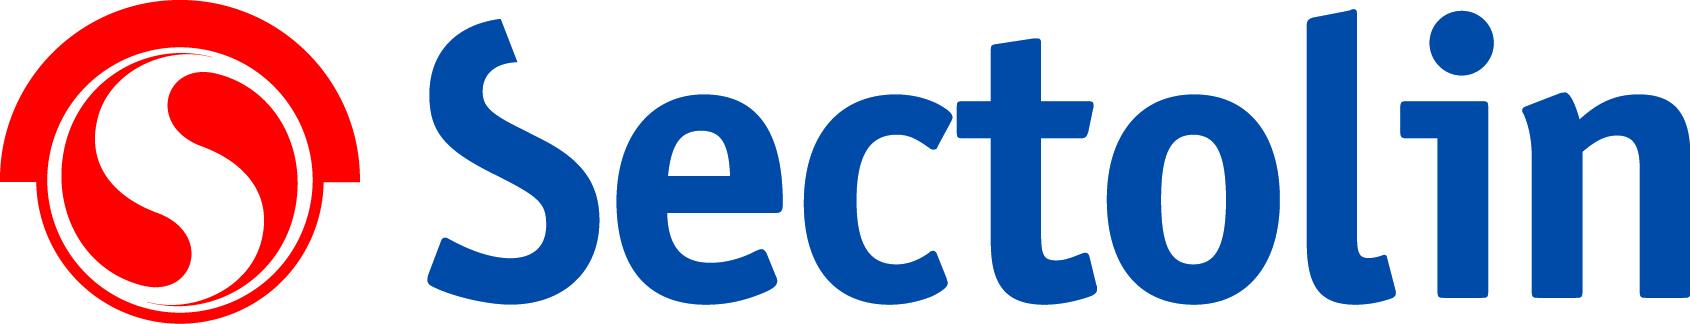 sectolin logo